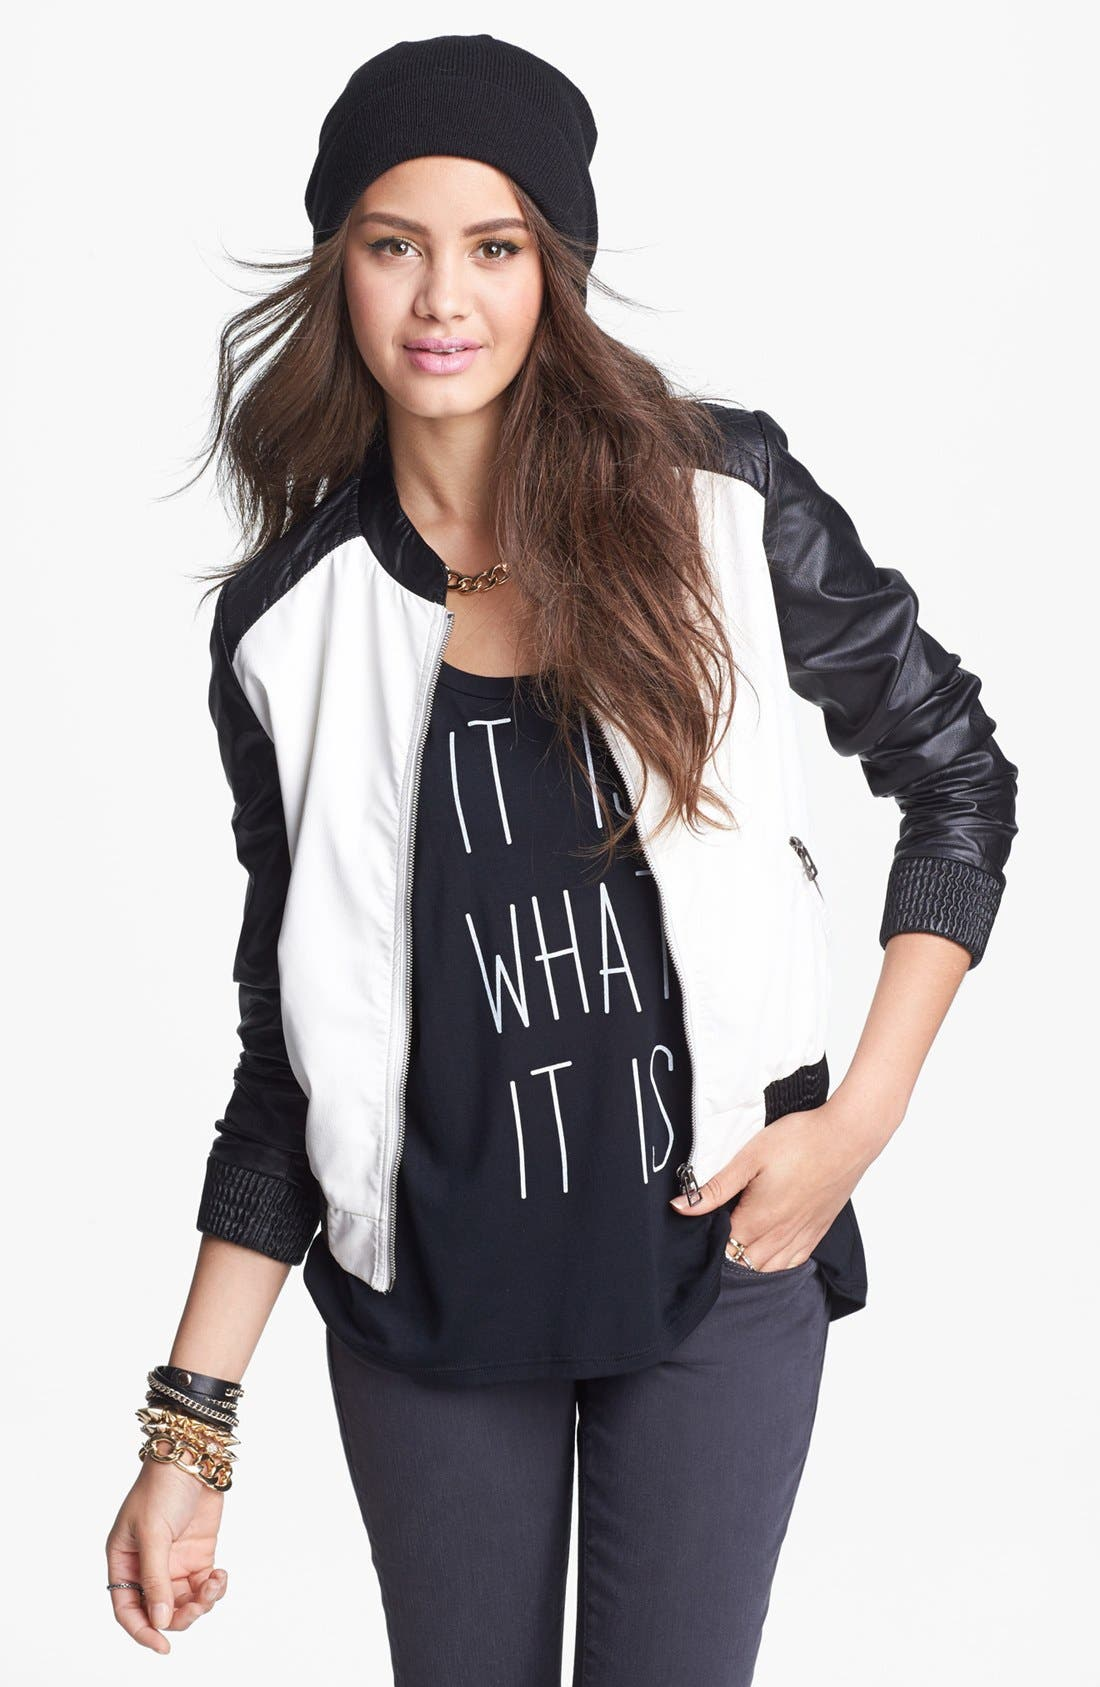 Alternate Image 1 Selected - Jolt Faux Leather Colorblock Jacket (Juniors)